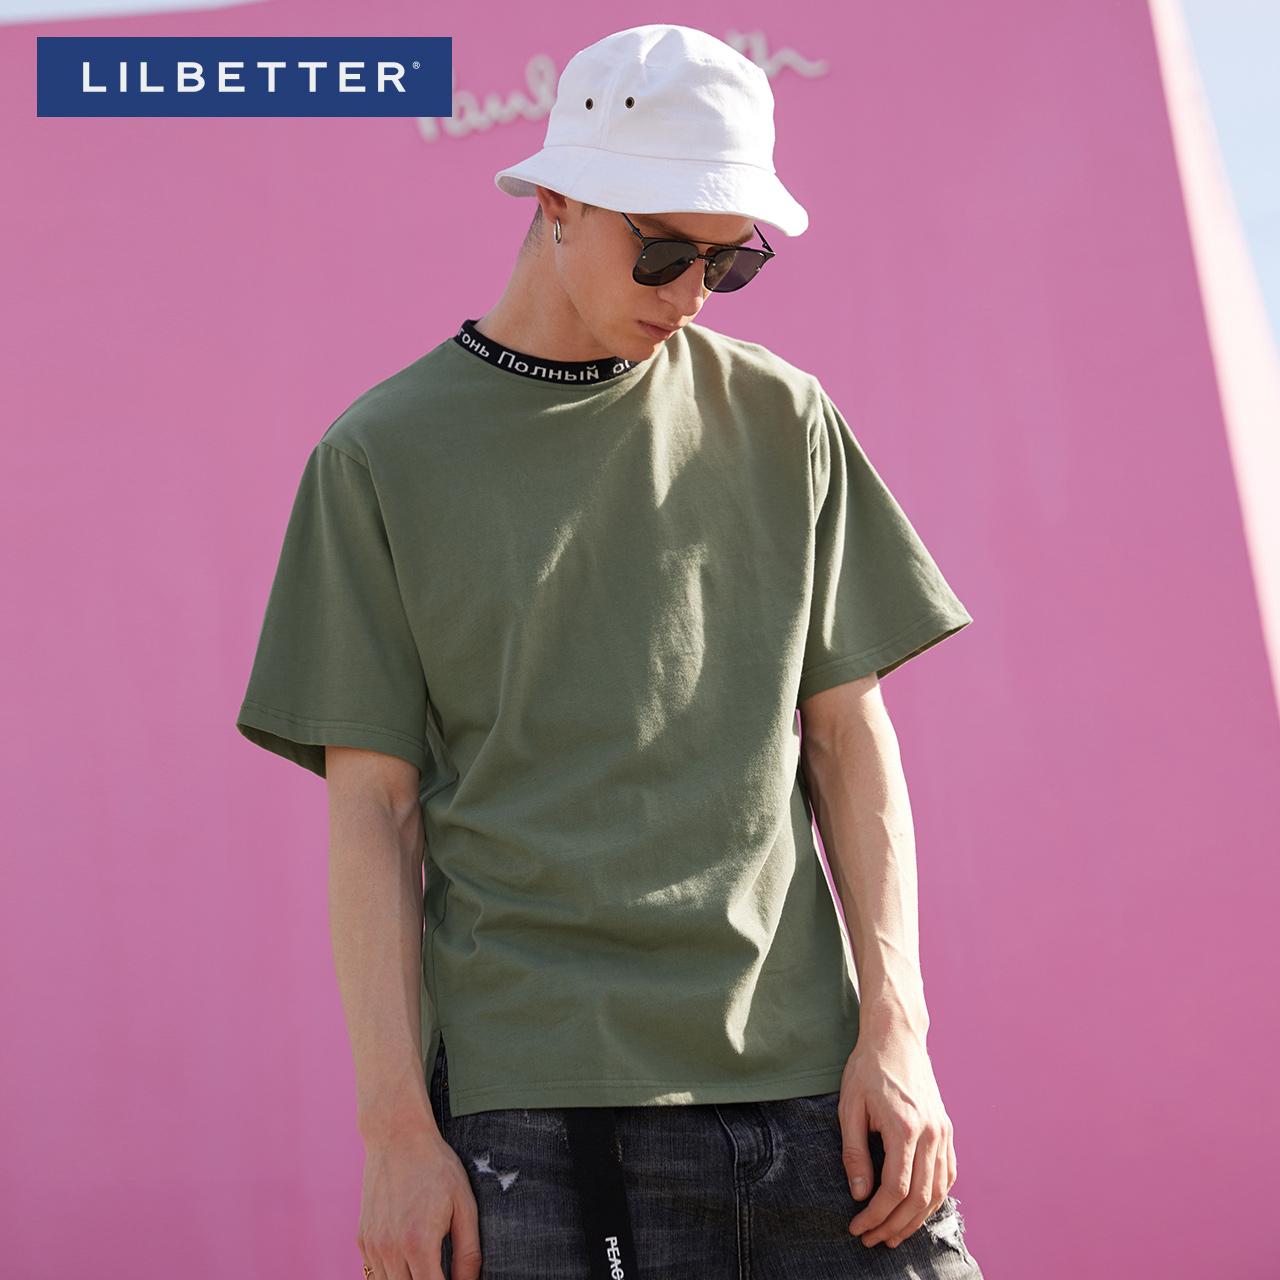 lilbetter嘻哈潮流學生男士圓領t恤